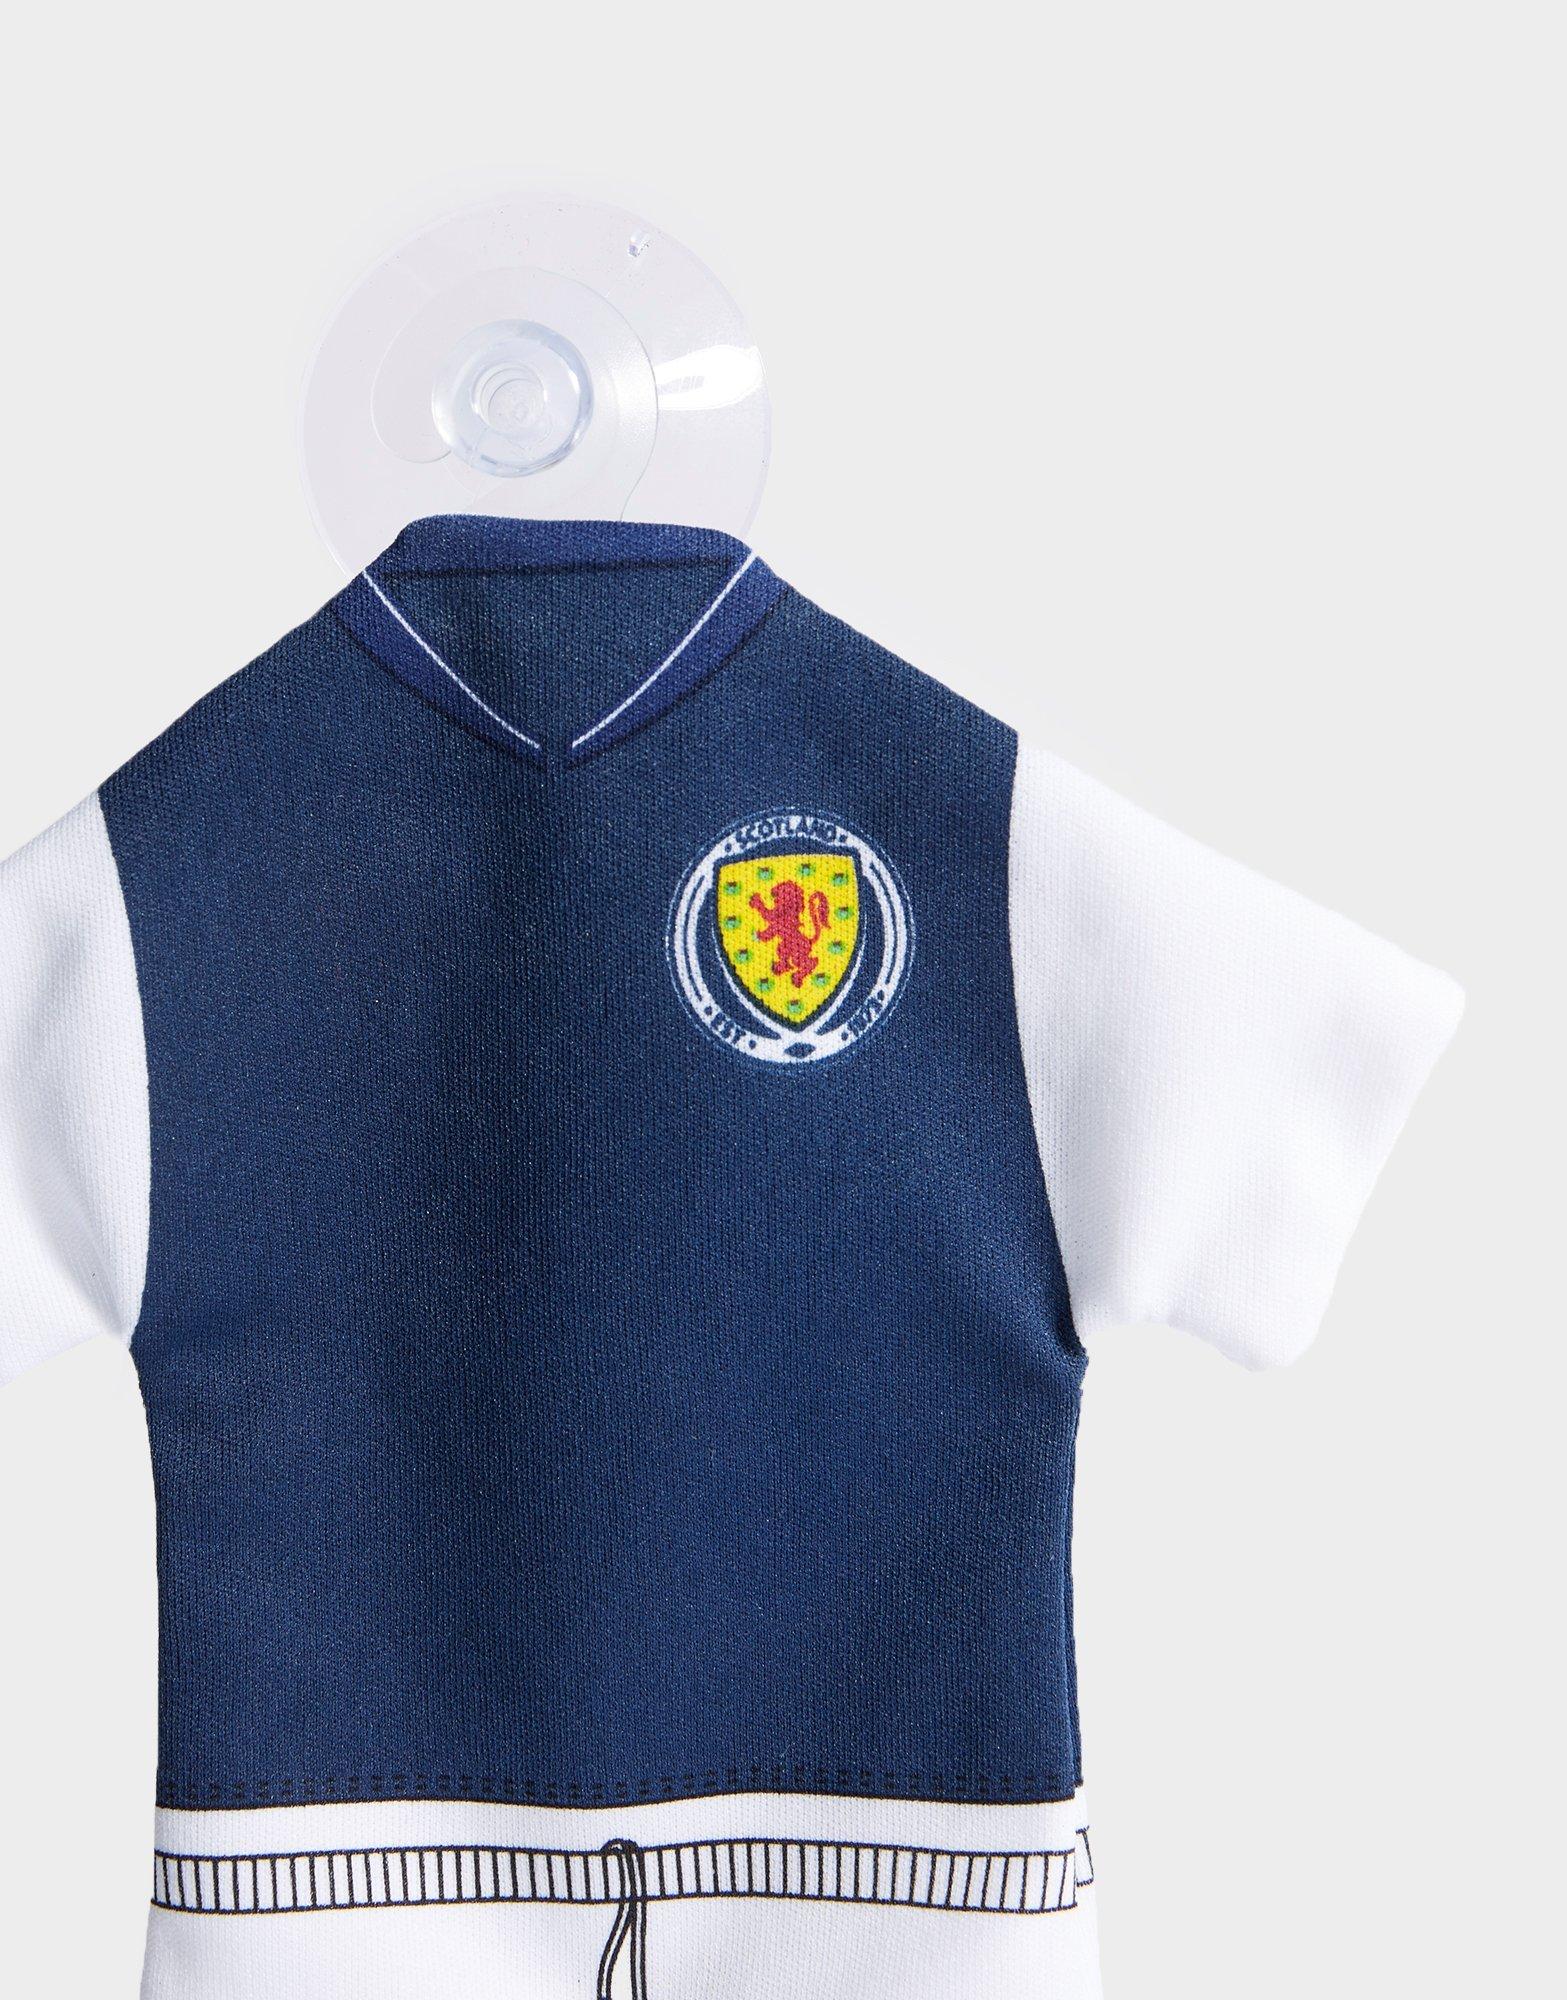 Official Team Scotland FA Home Kit Car Hanger